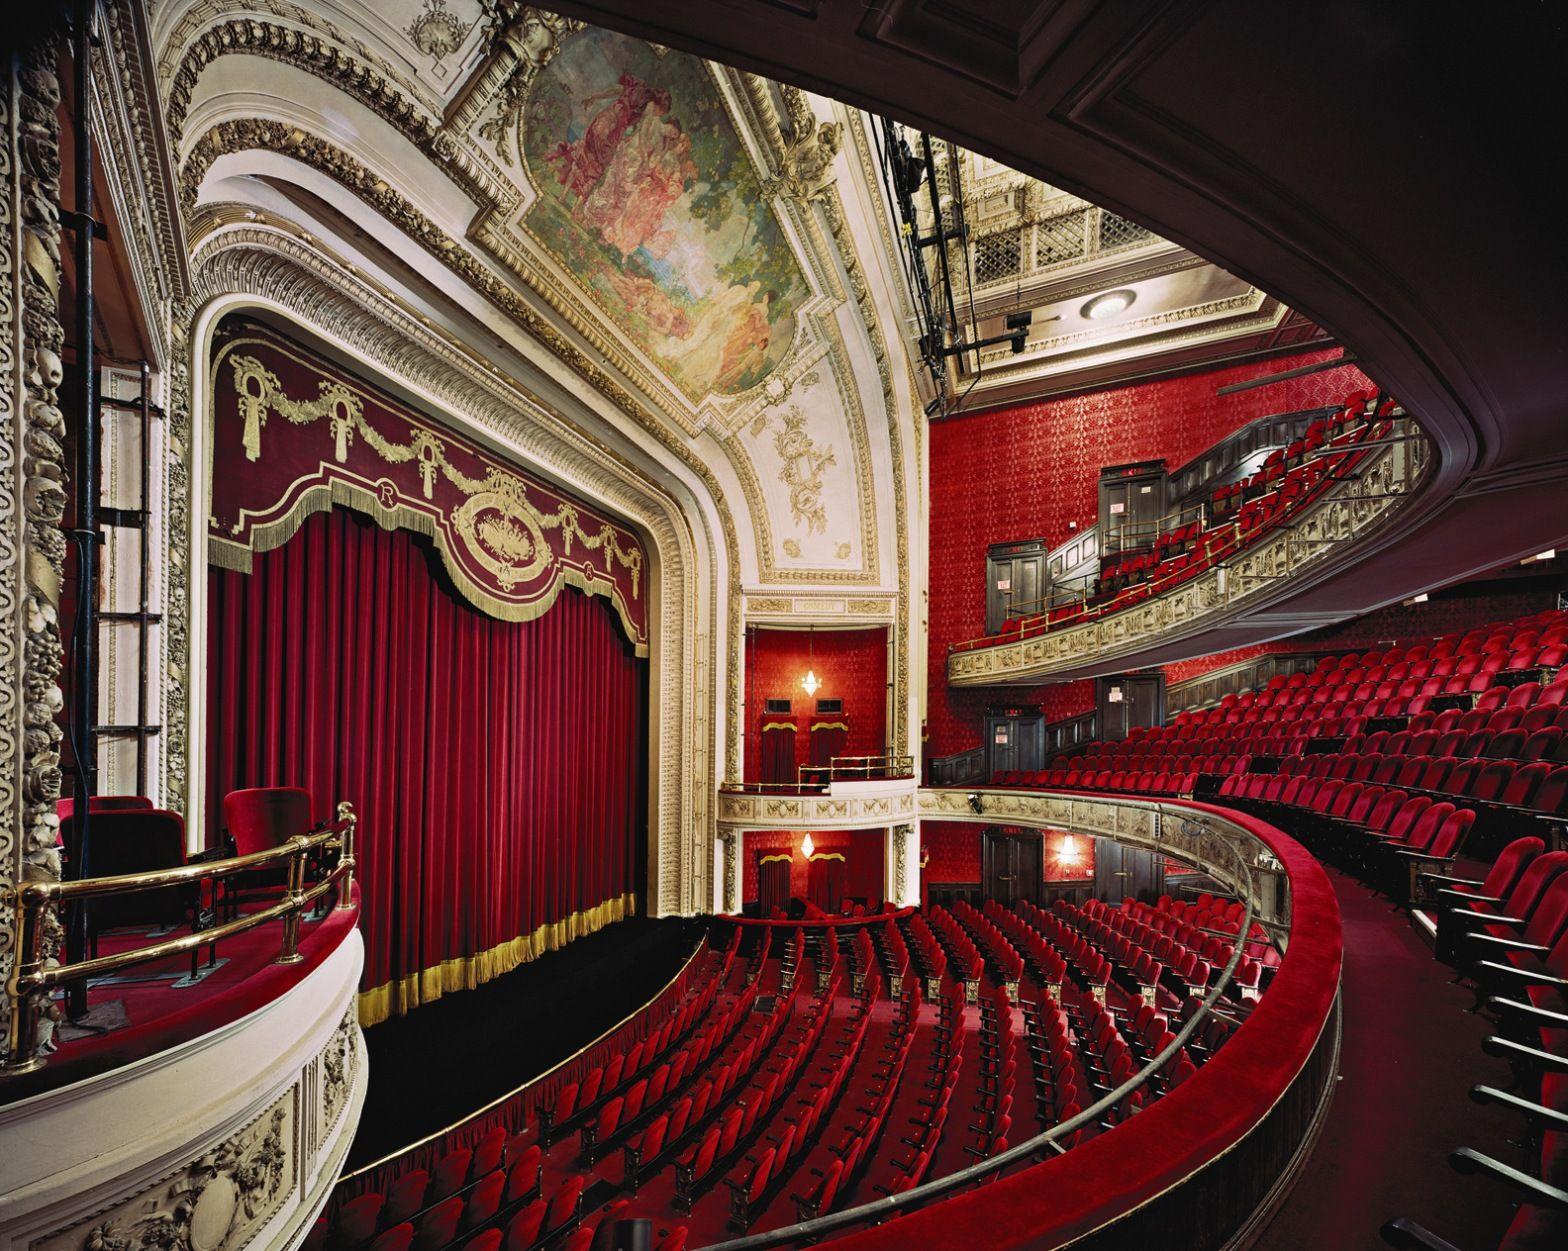 Edward Burtynsky S Photo Of The Royal Alexandra Theater